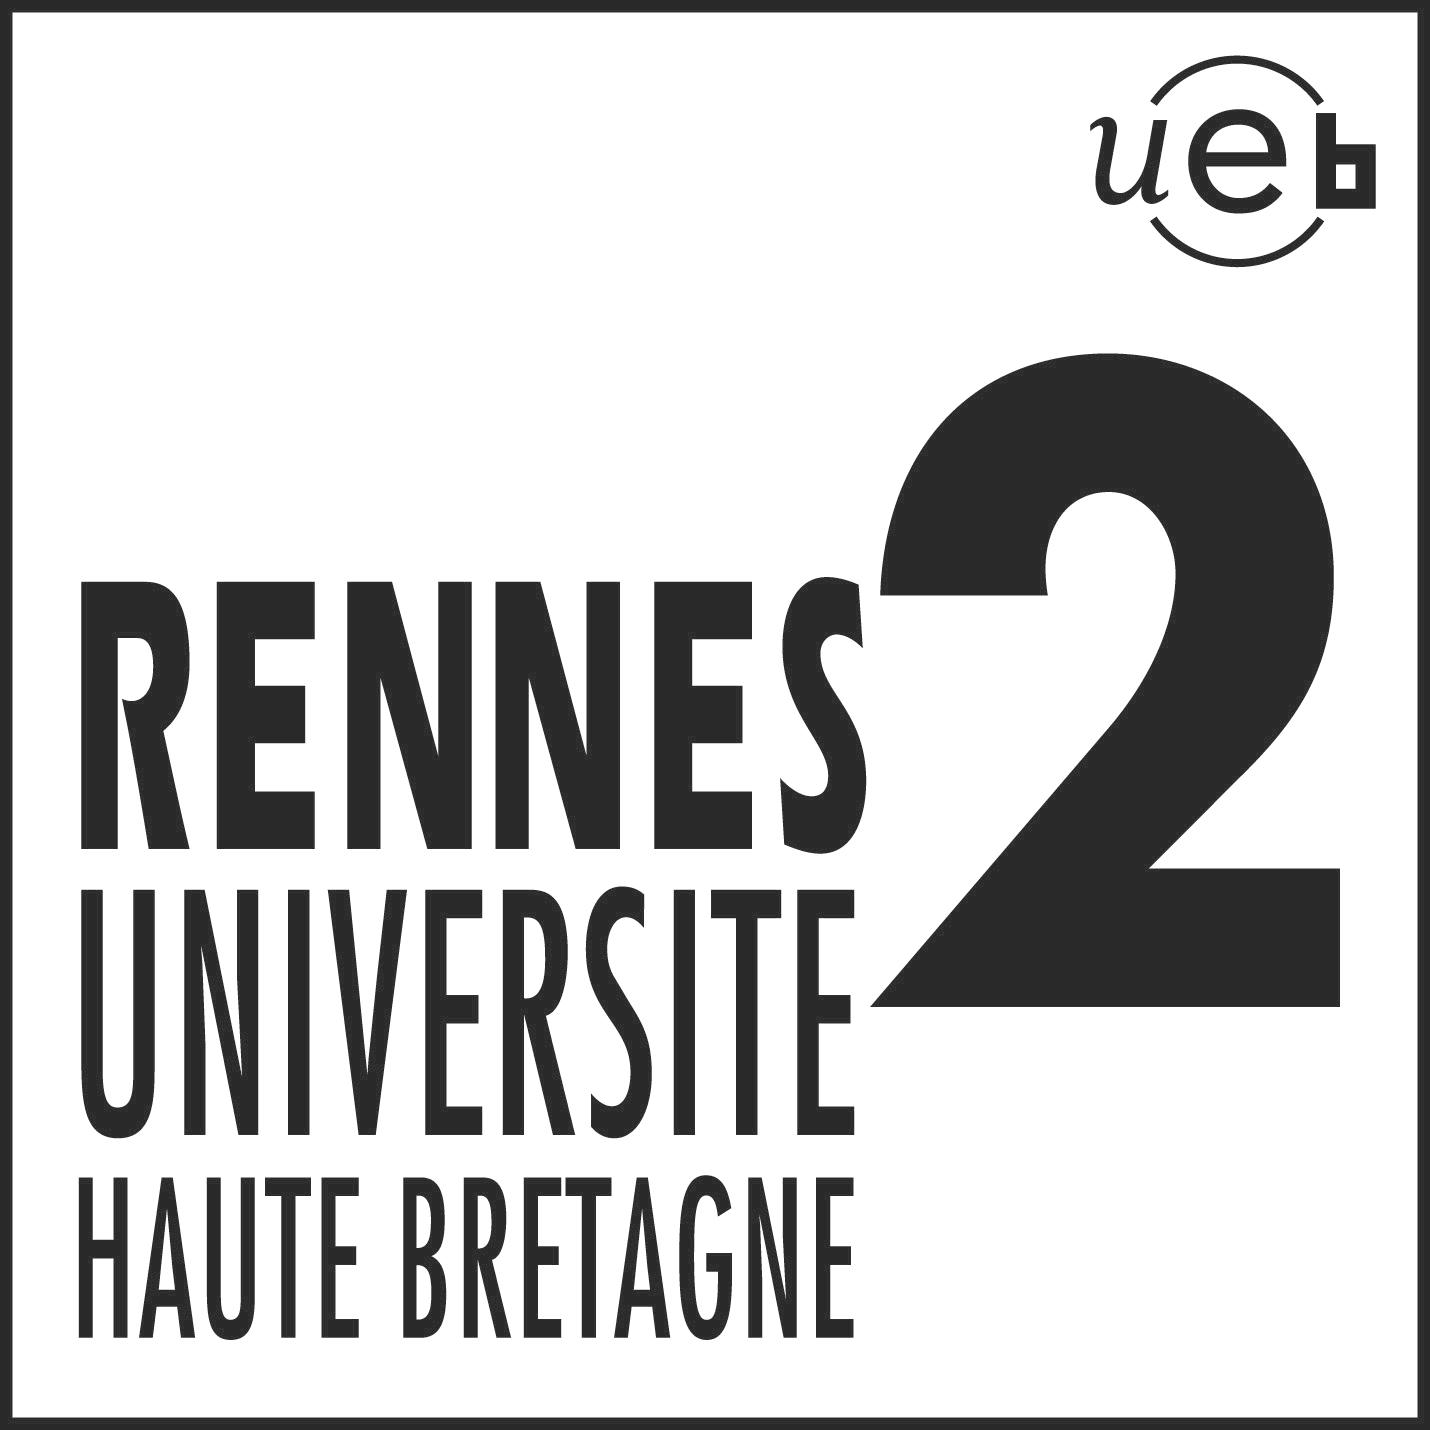 logo rennes 2 ueb